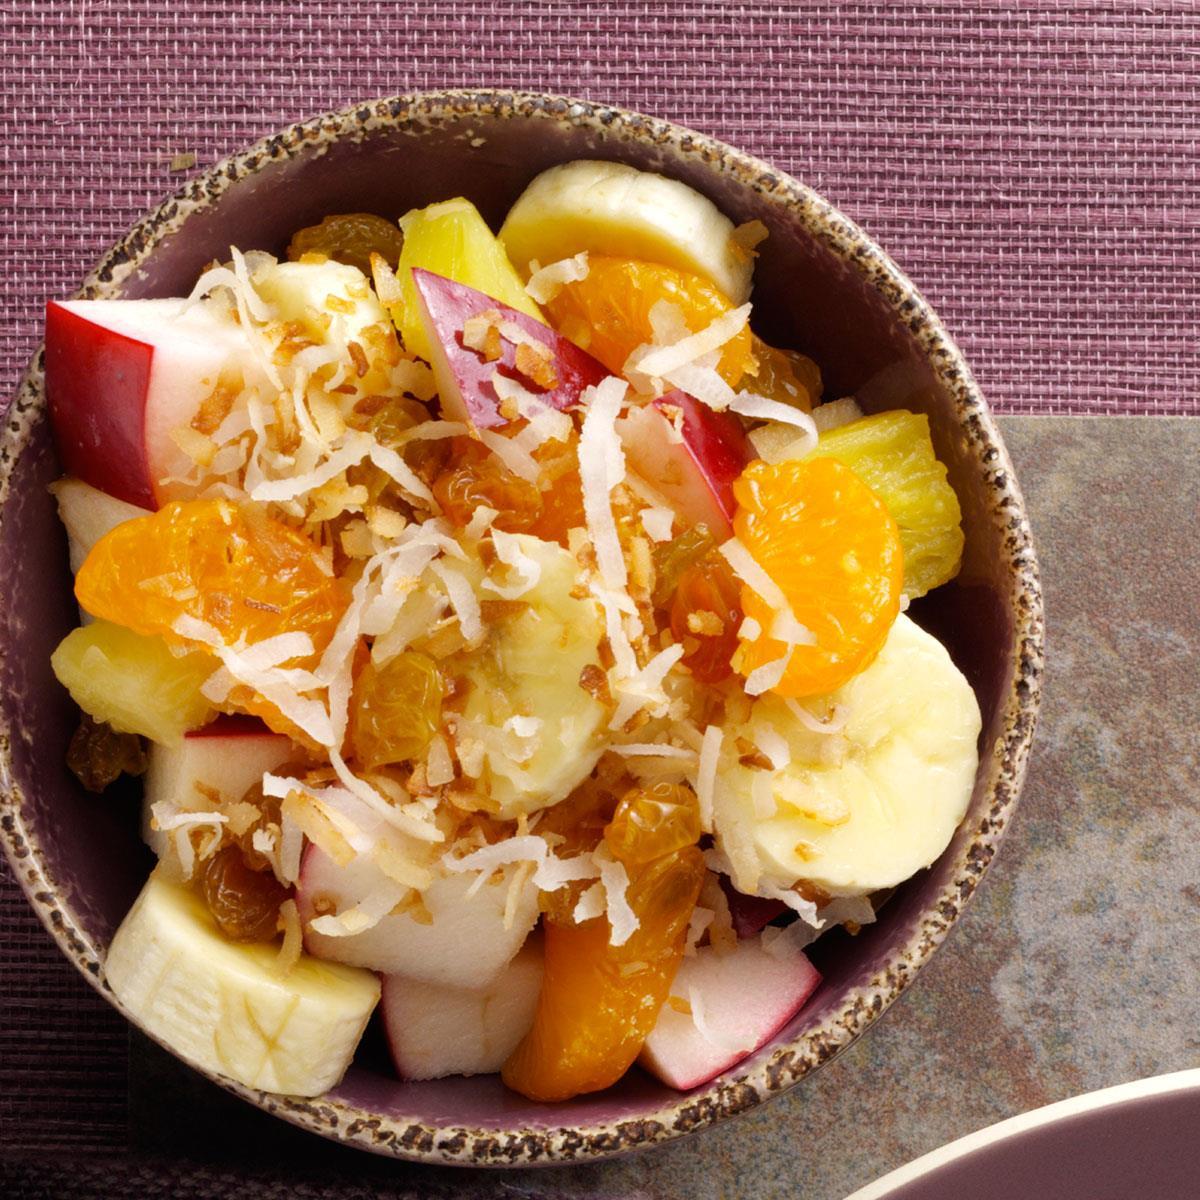 Coconut Fruit Salad Recipe | Taste of Home